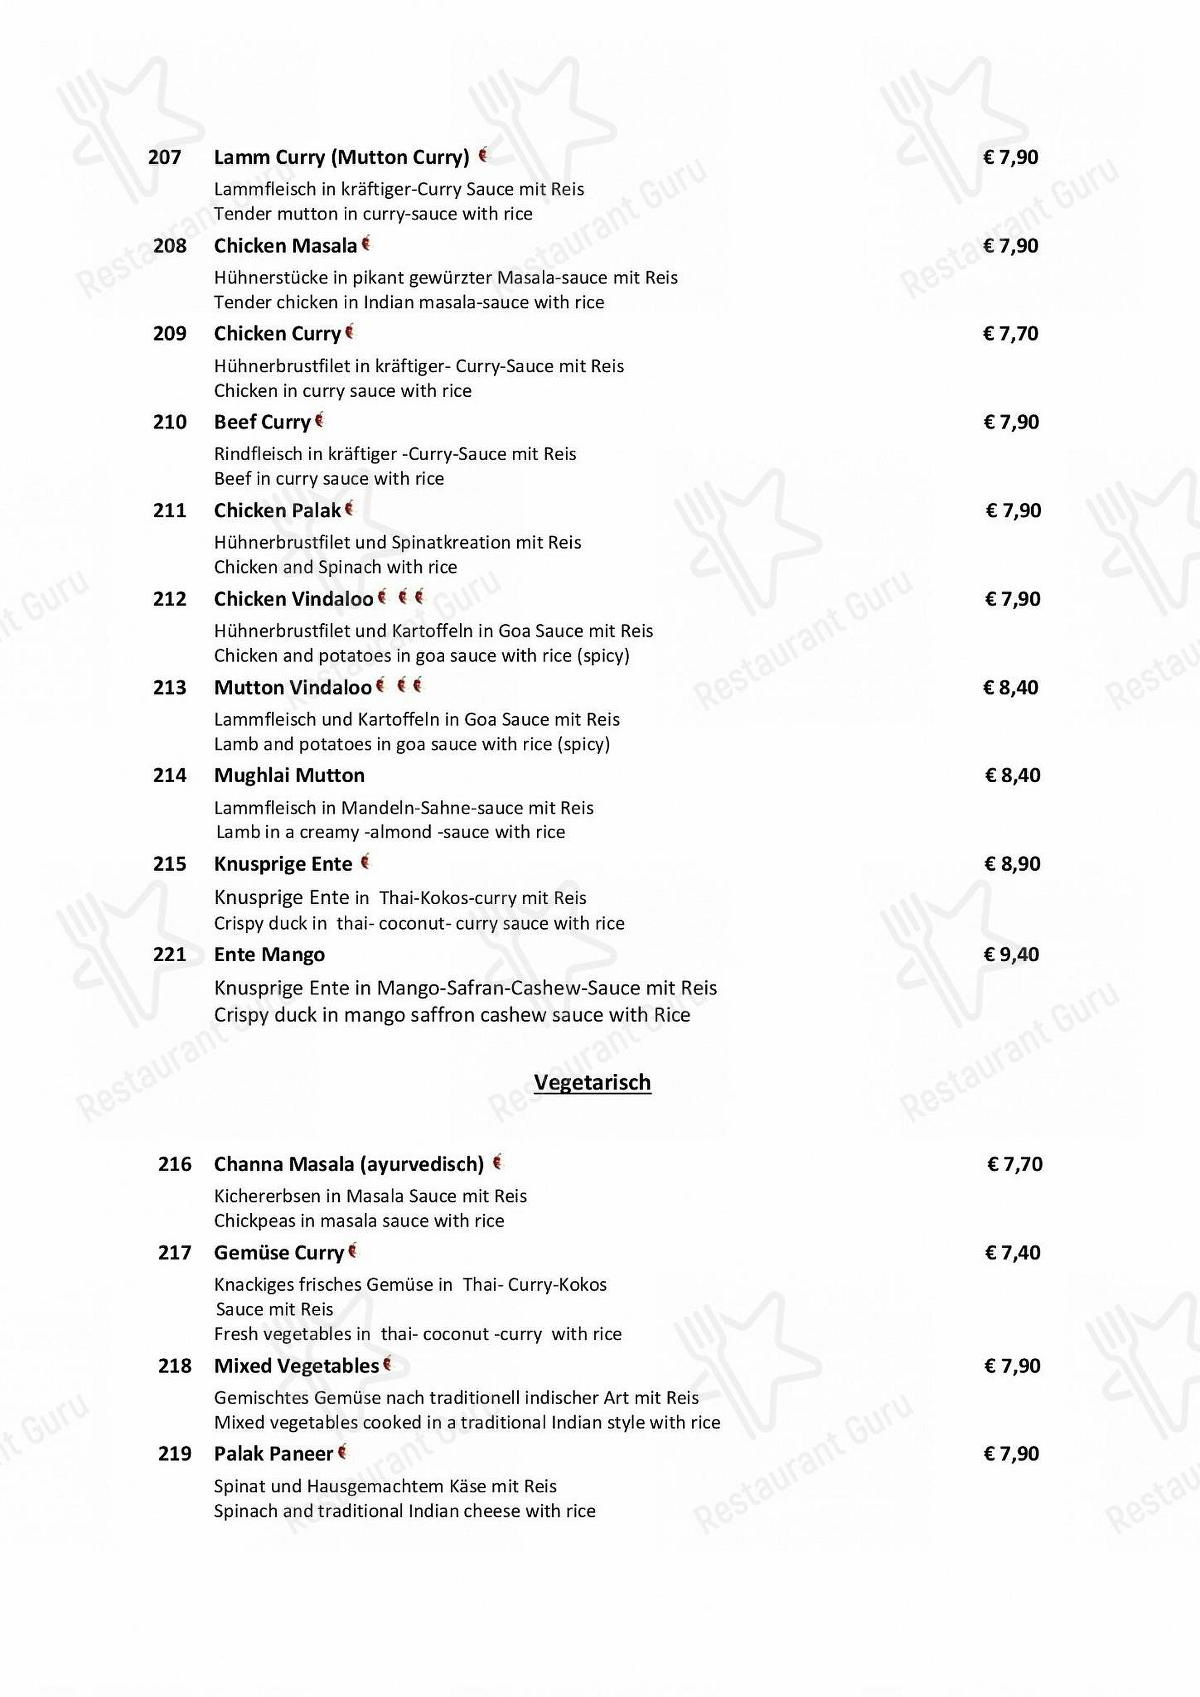 Bollywood Speisekarte - Lunch Menu